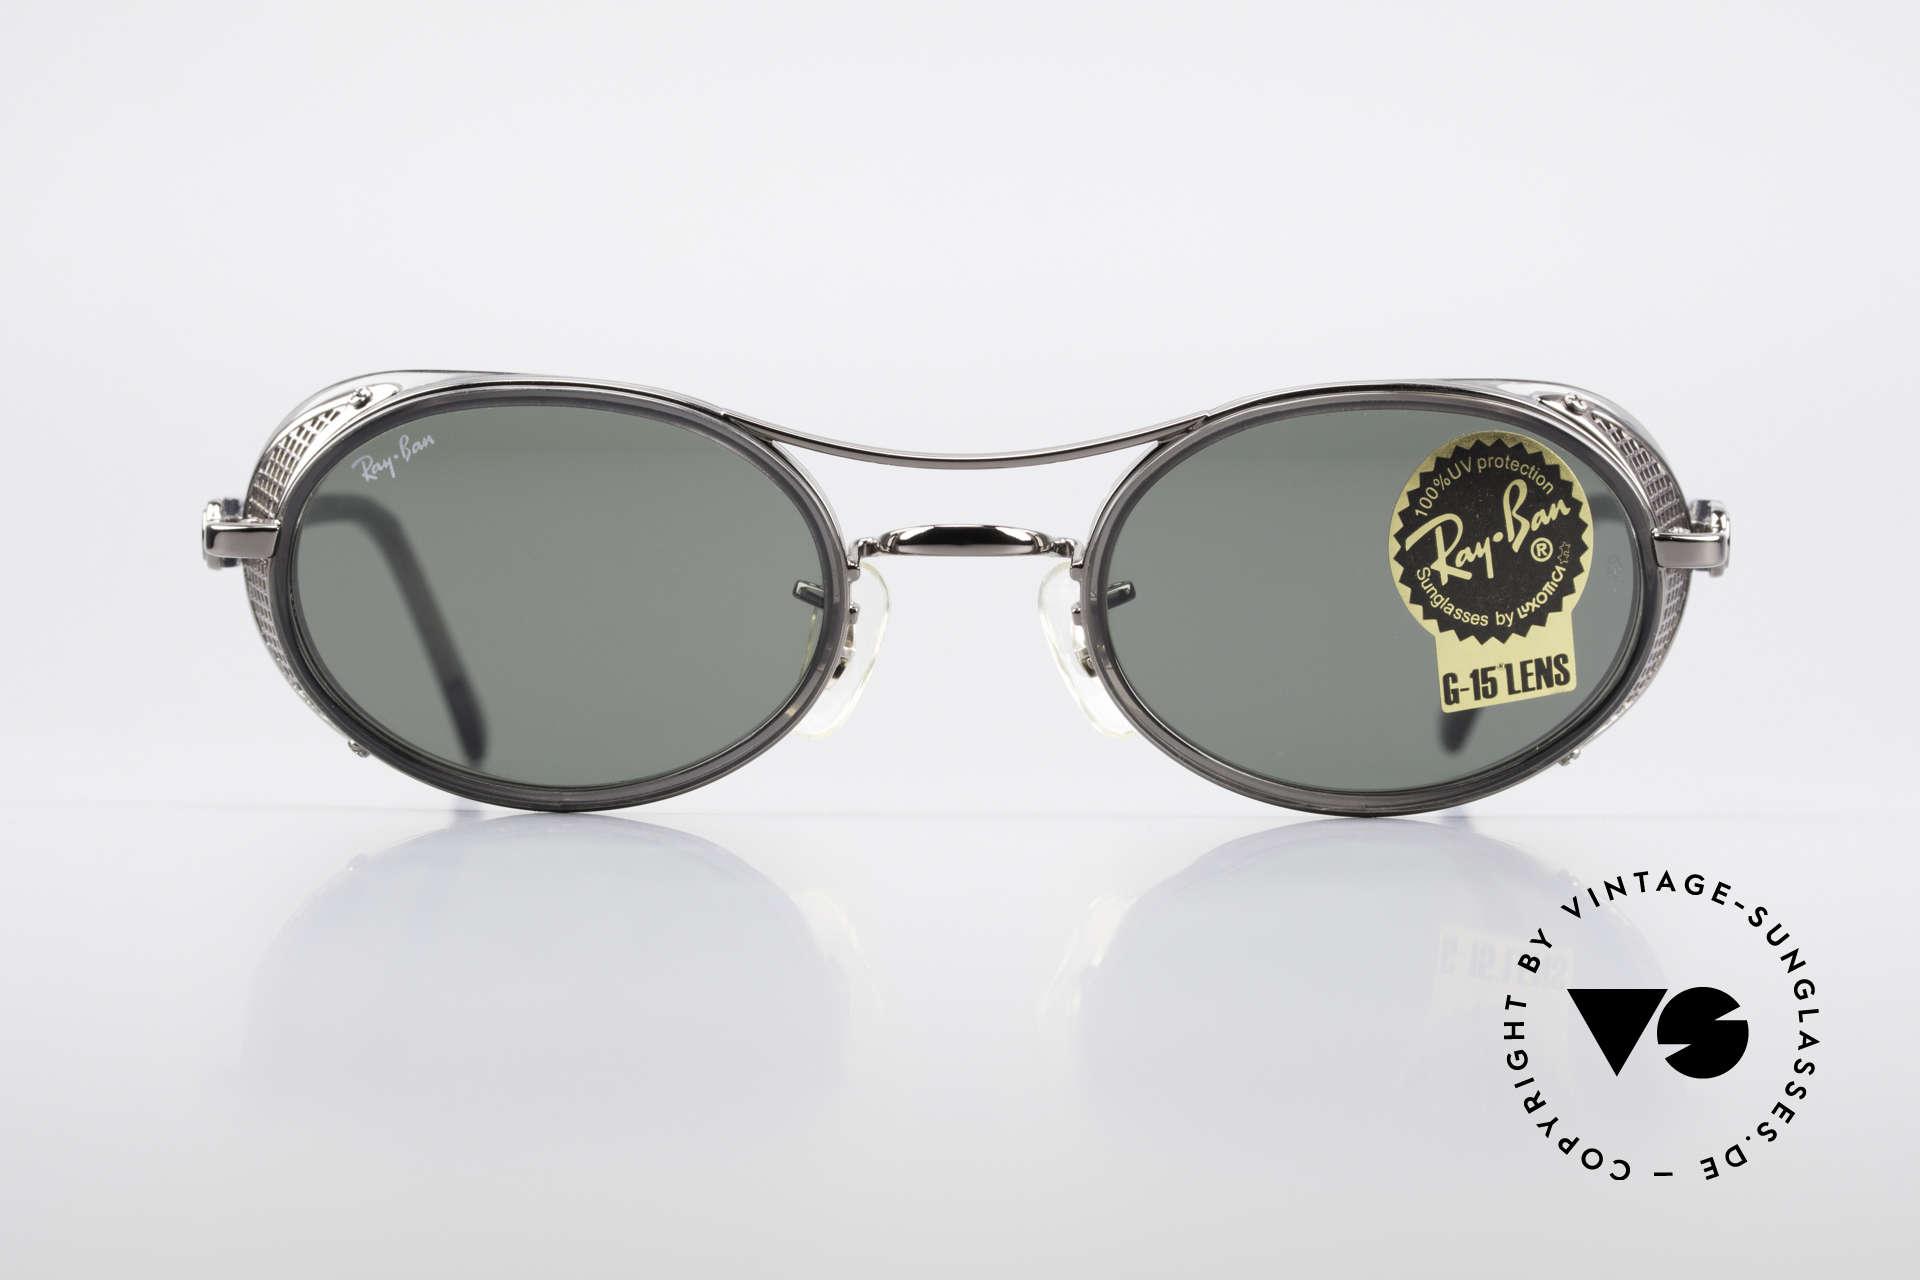 ba4af1b6d Sunglasses Ray Ban Chaos RB3140 B&L USA Luxottica Italy Hybrid ...